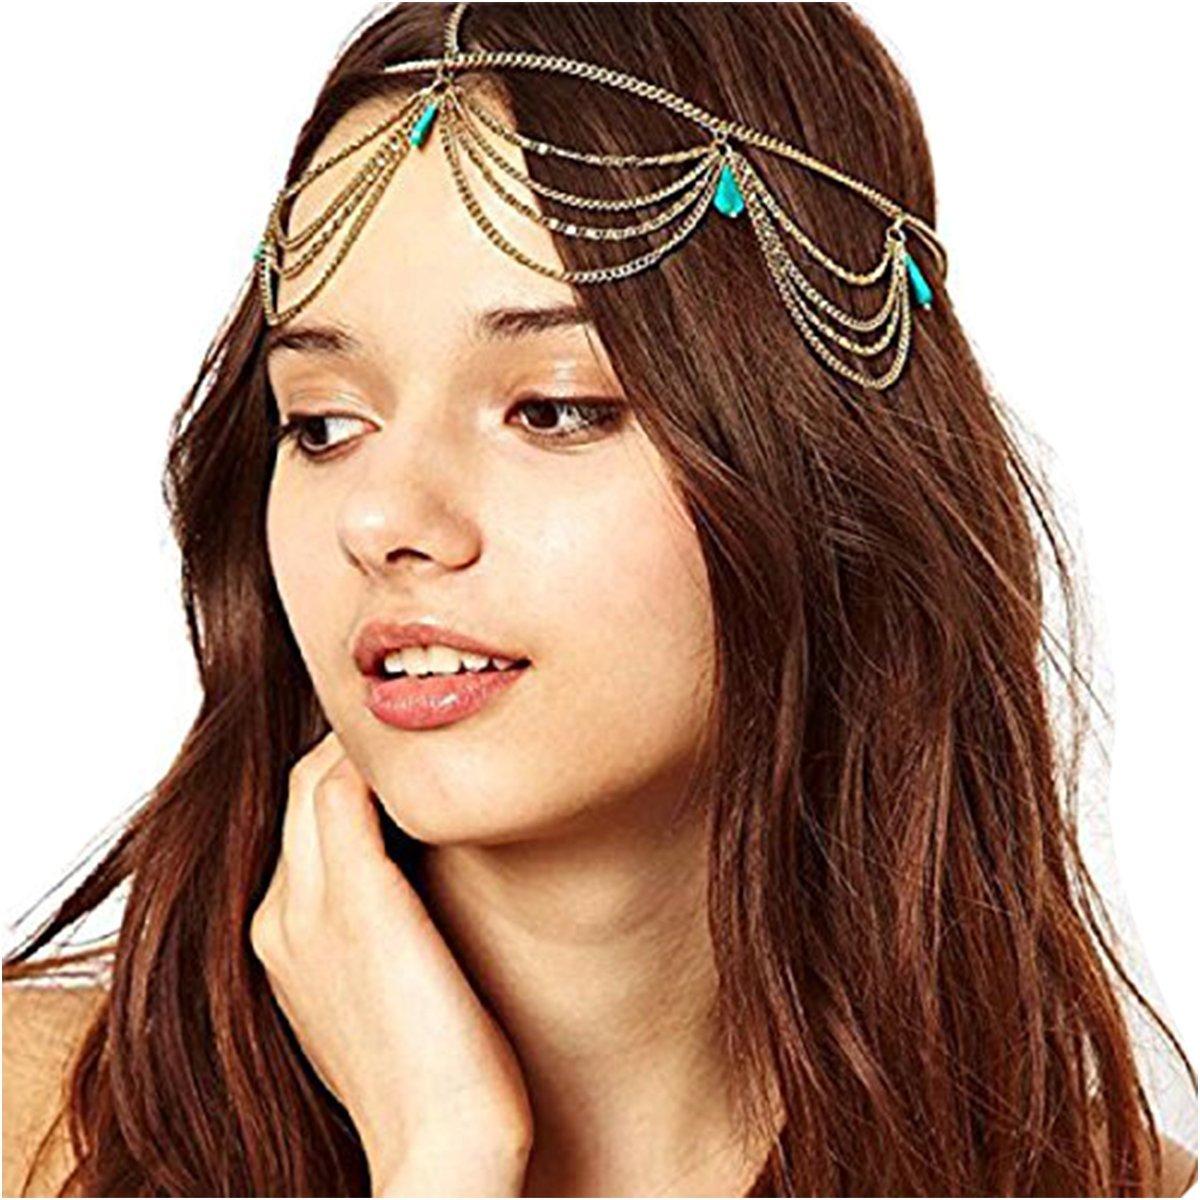 Baishitop Women Chain Headband, Imitation Turquoise Headpiece Hair Band Baishitop-220